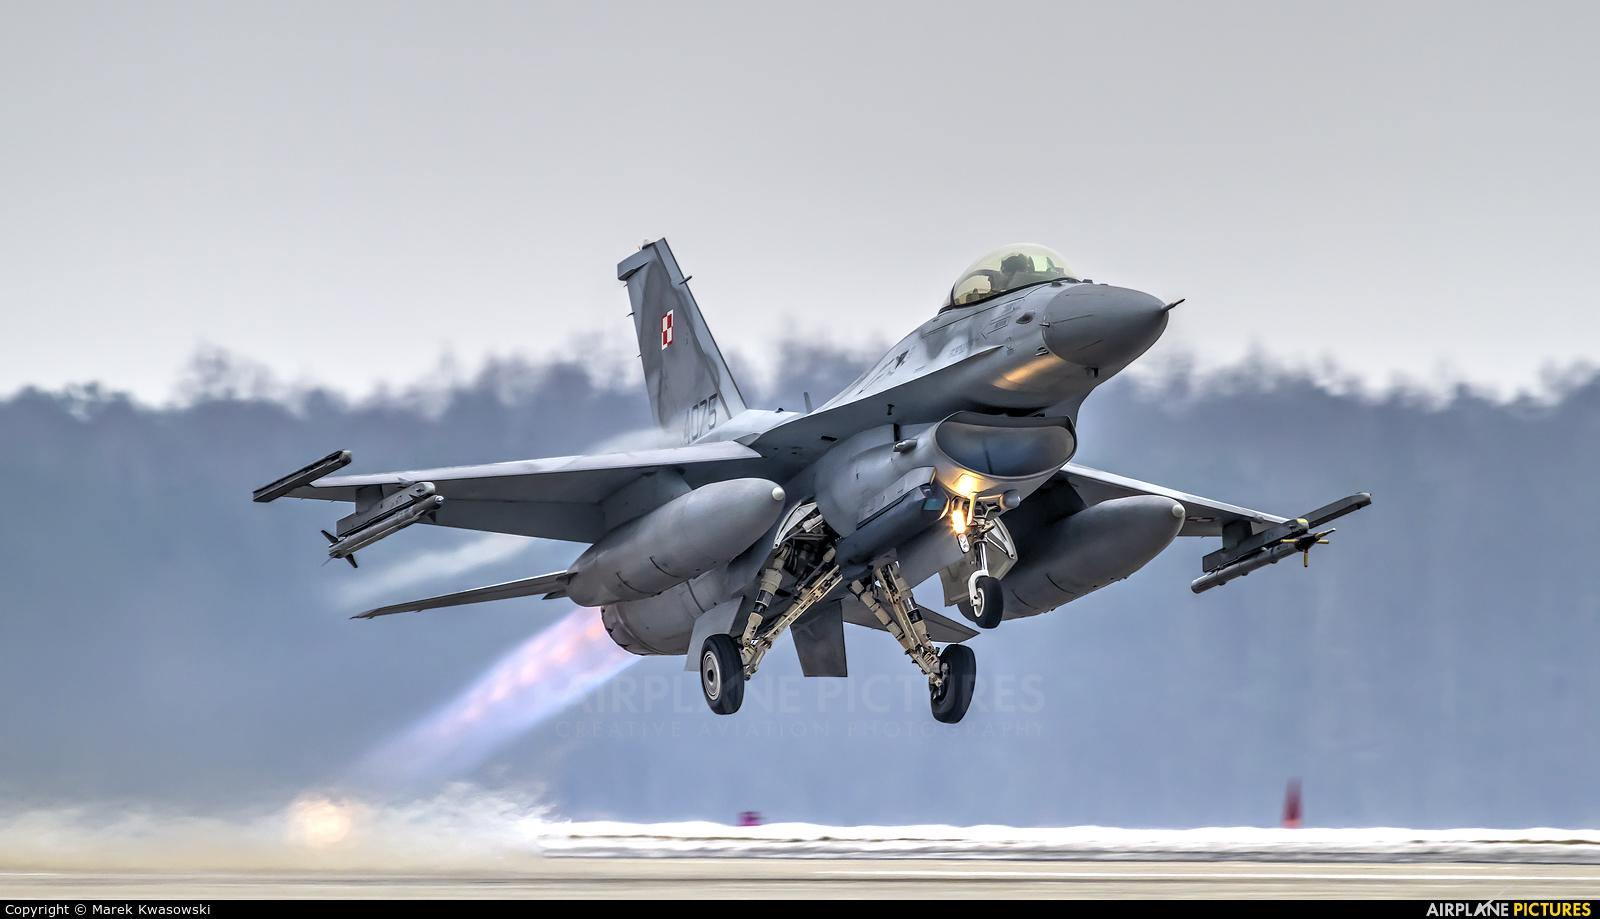 Poland - Air Force 4075 aircraft at Łask AB